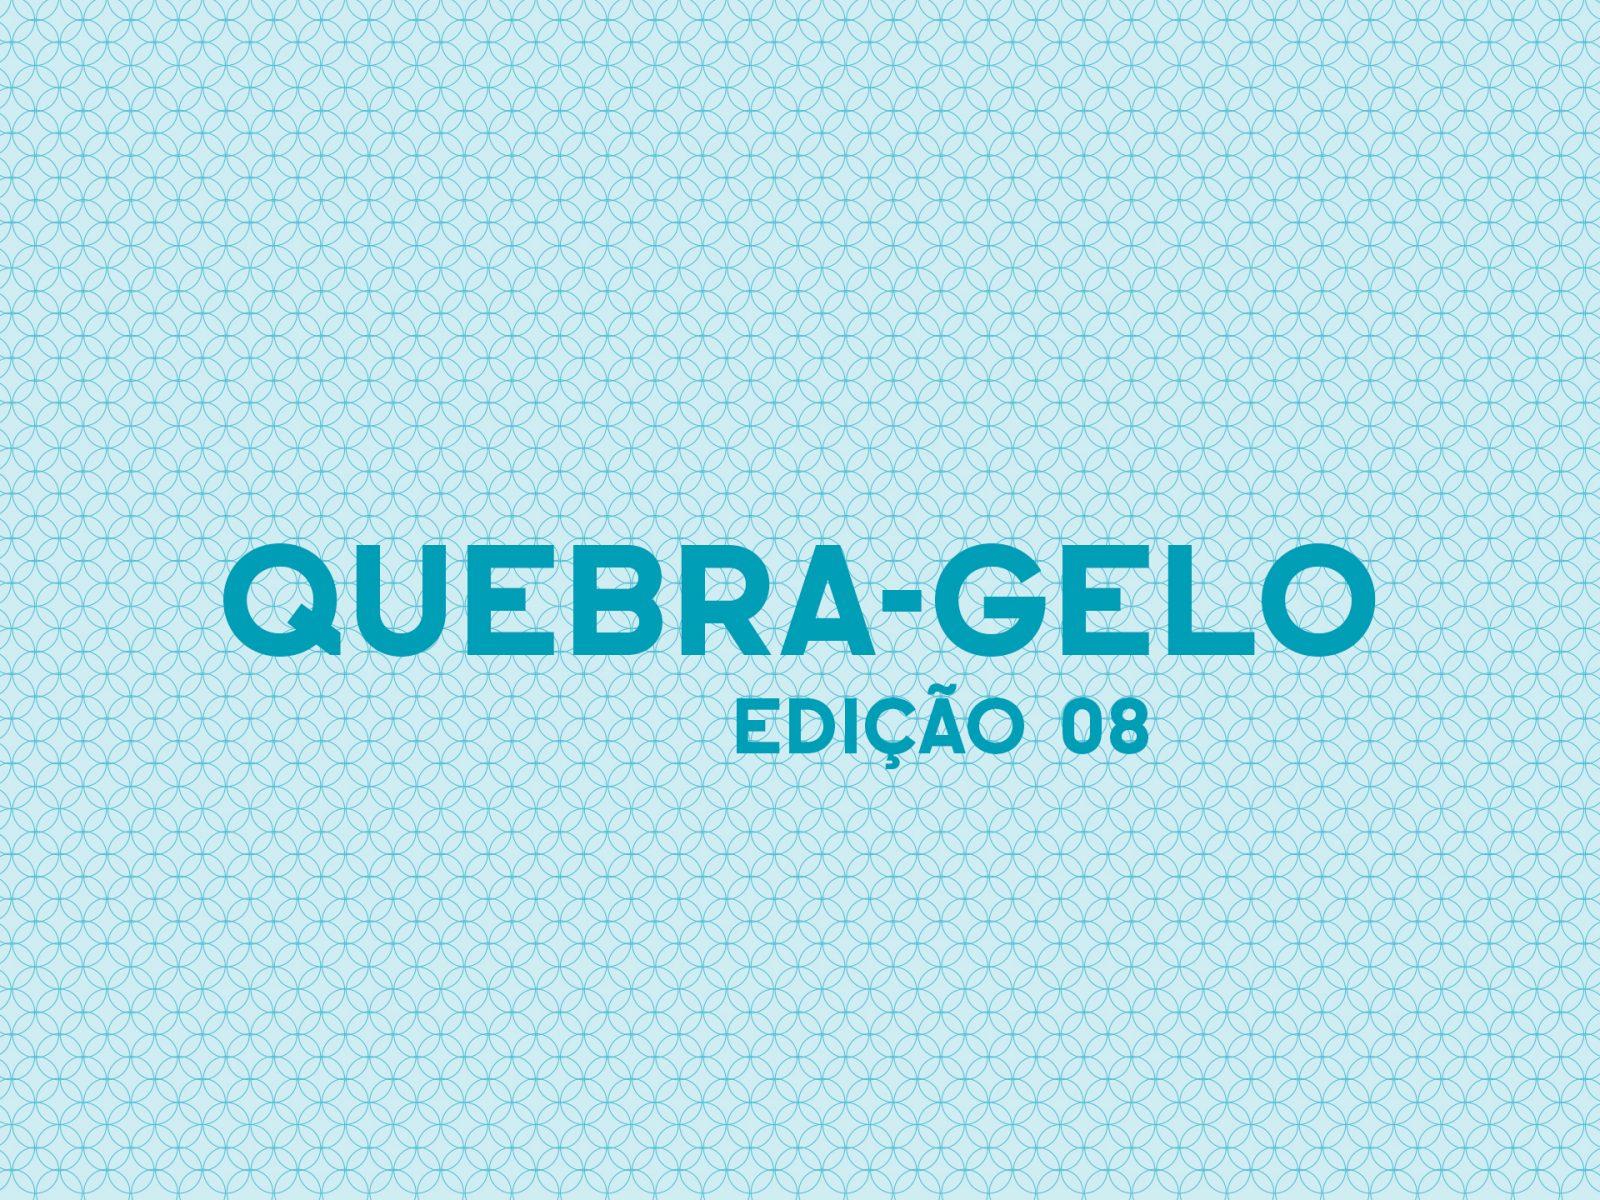 quebra_gelo_edicao_8